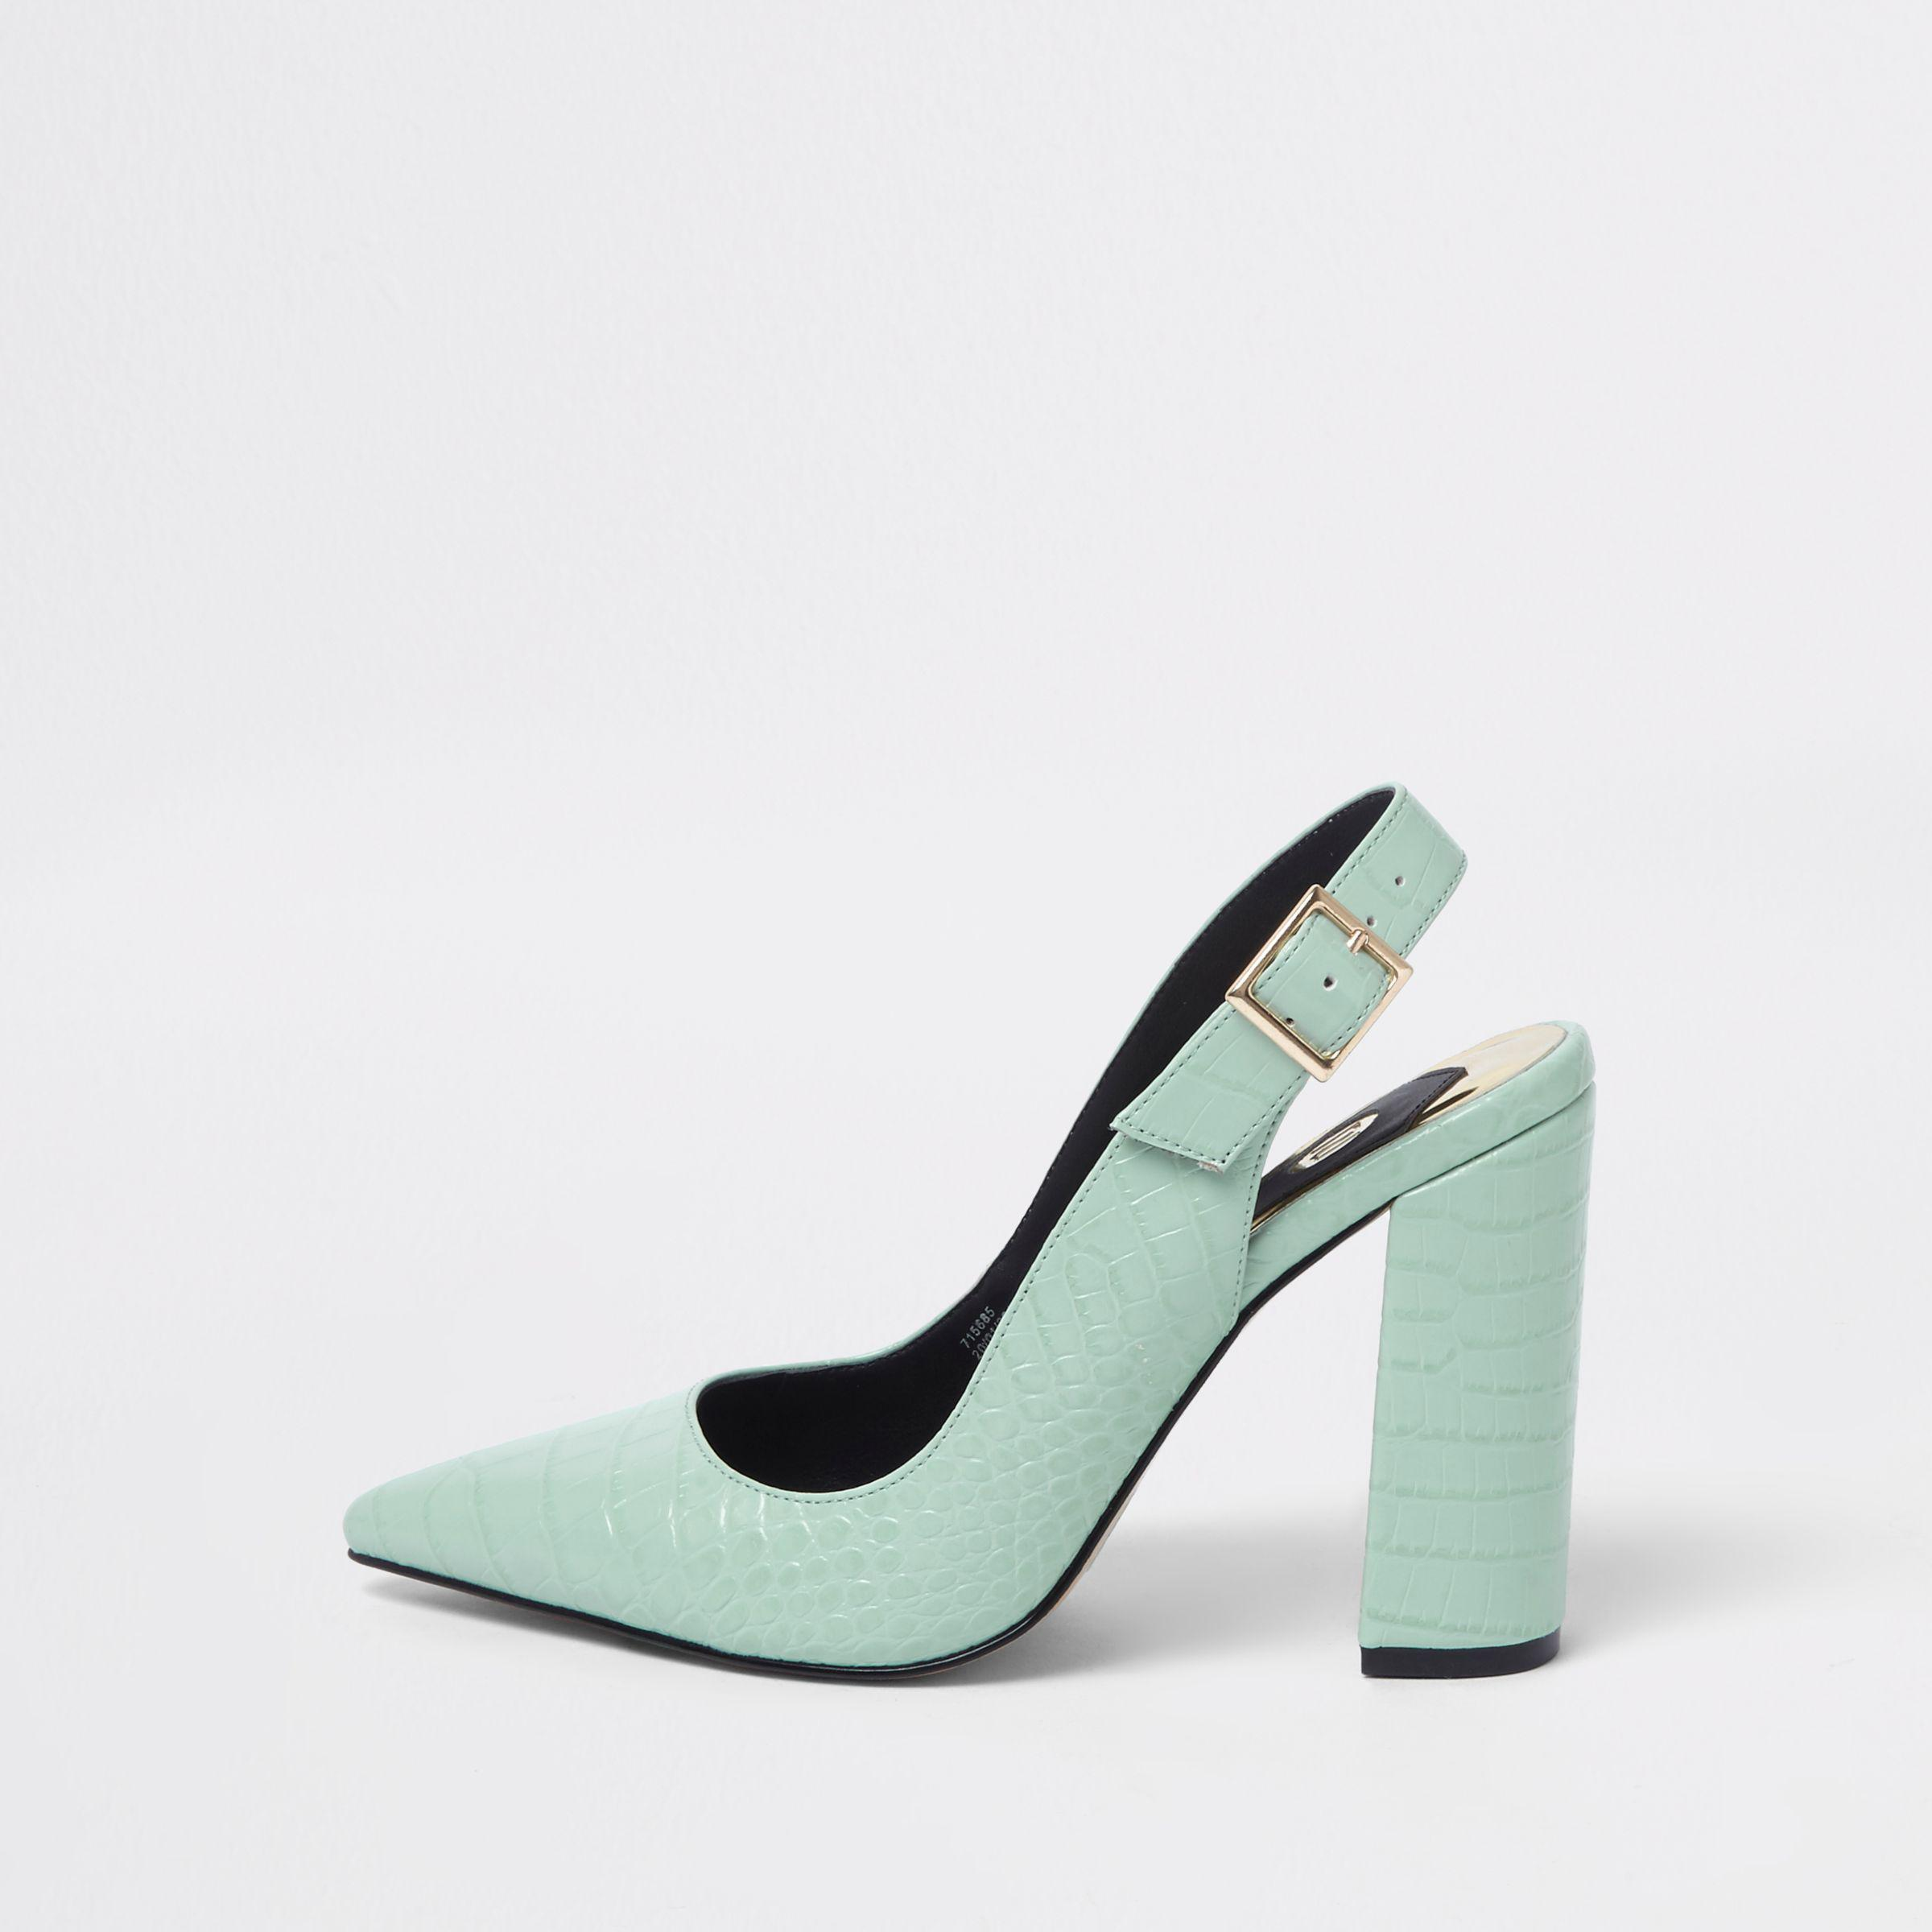 River Island Womens croc block heel sling back court shoes B4m7ggQZ